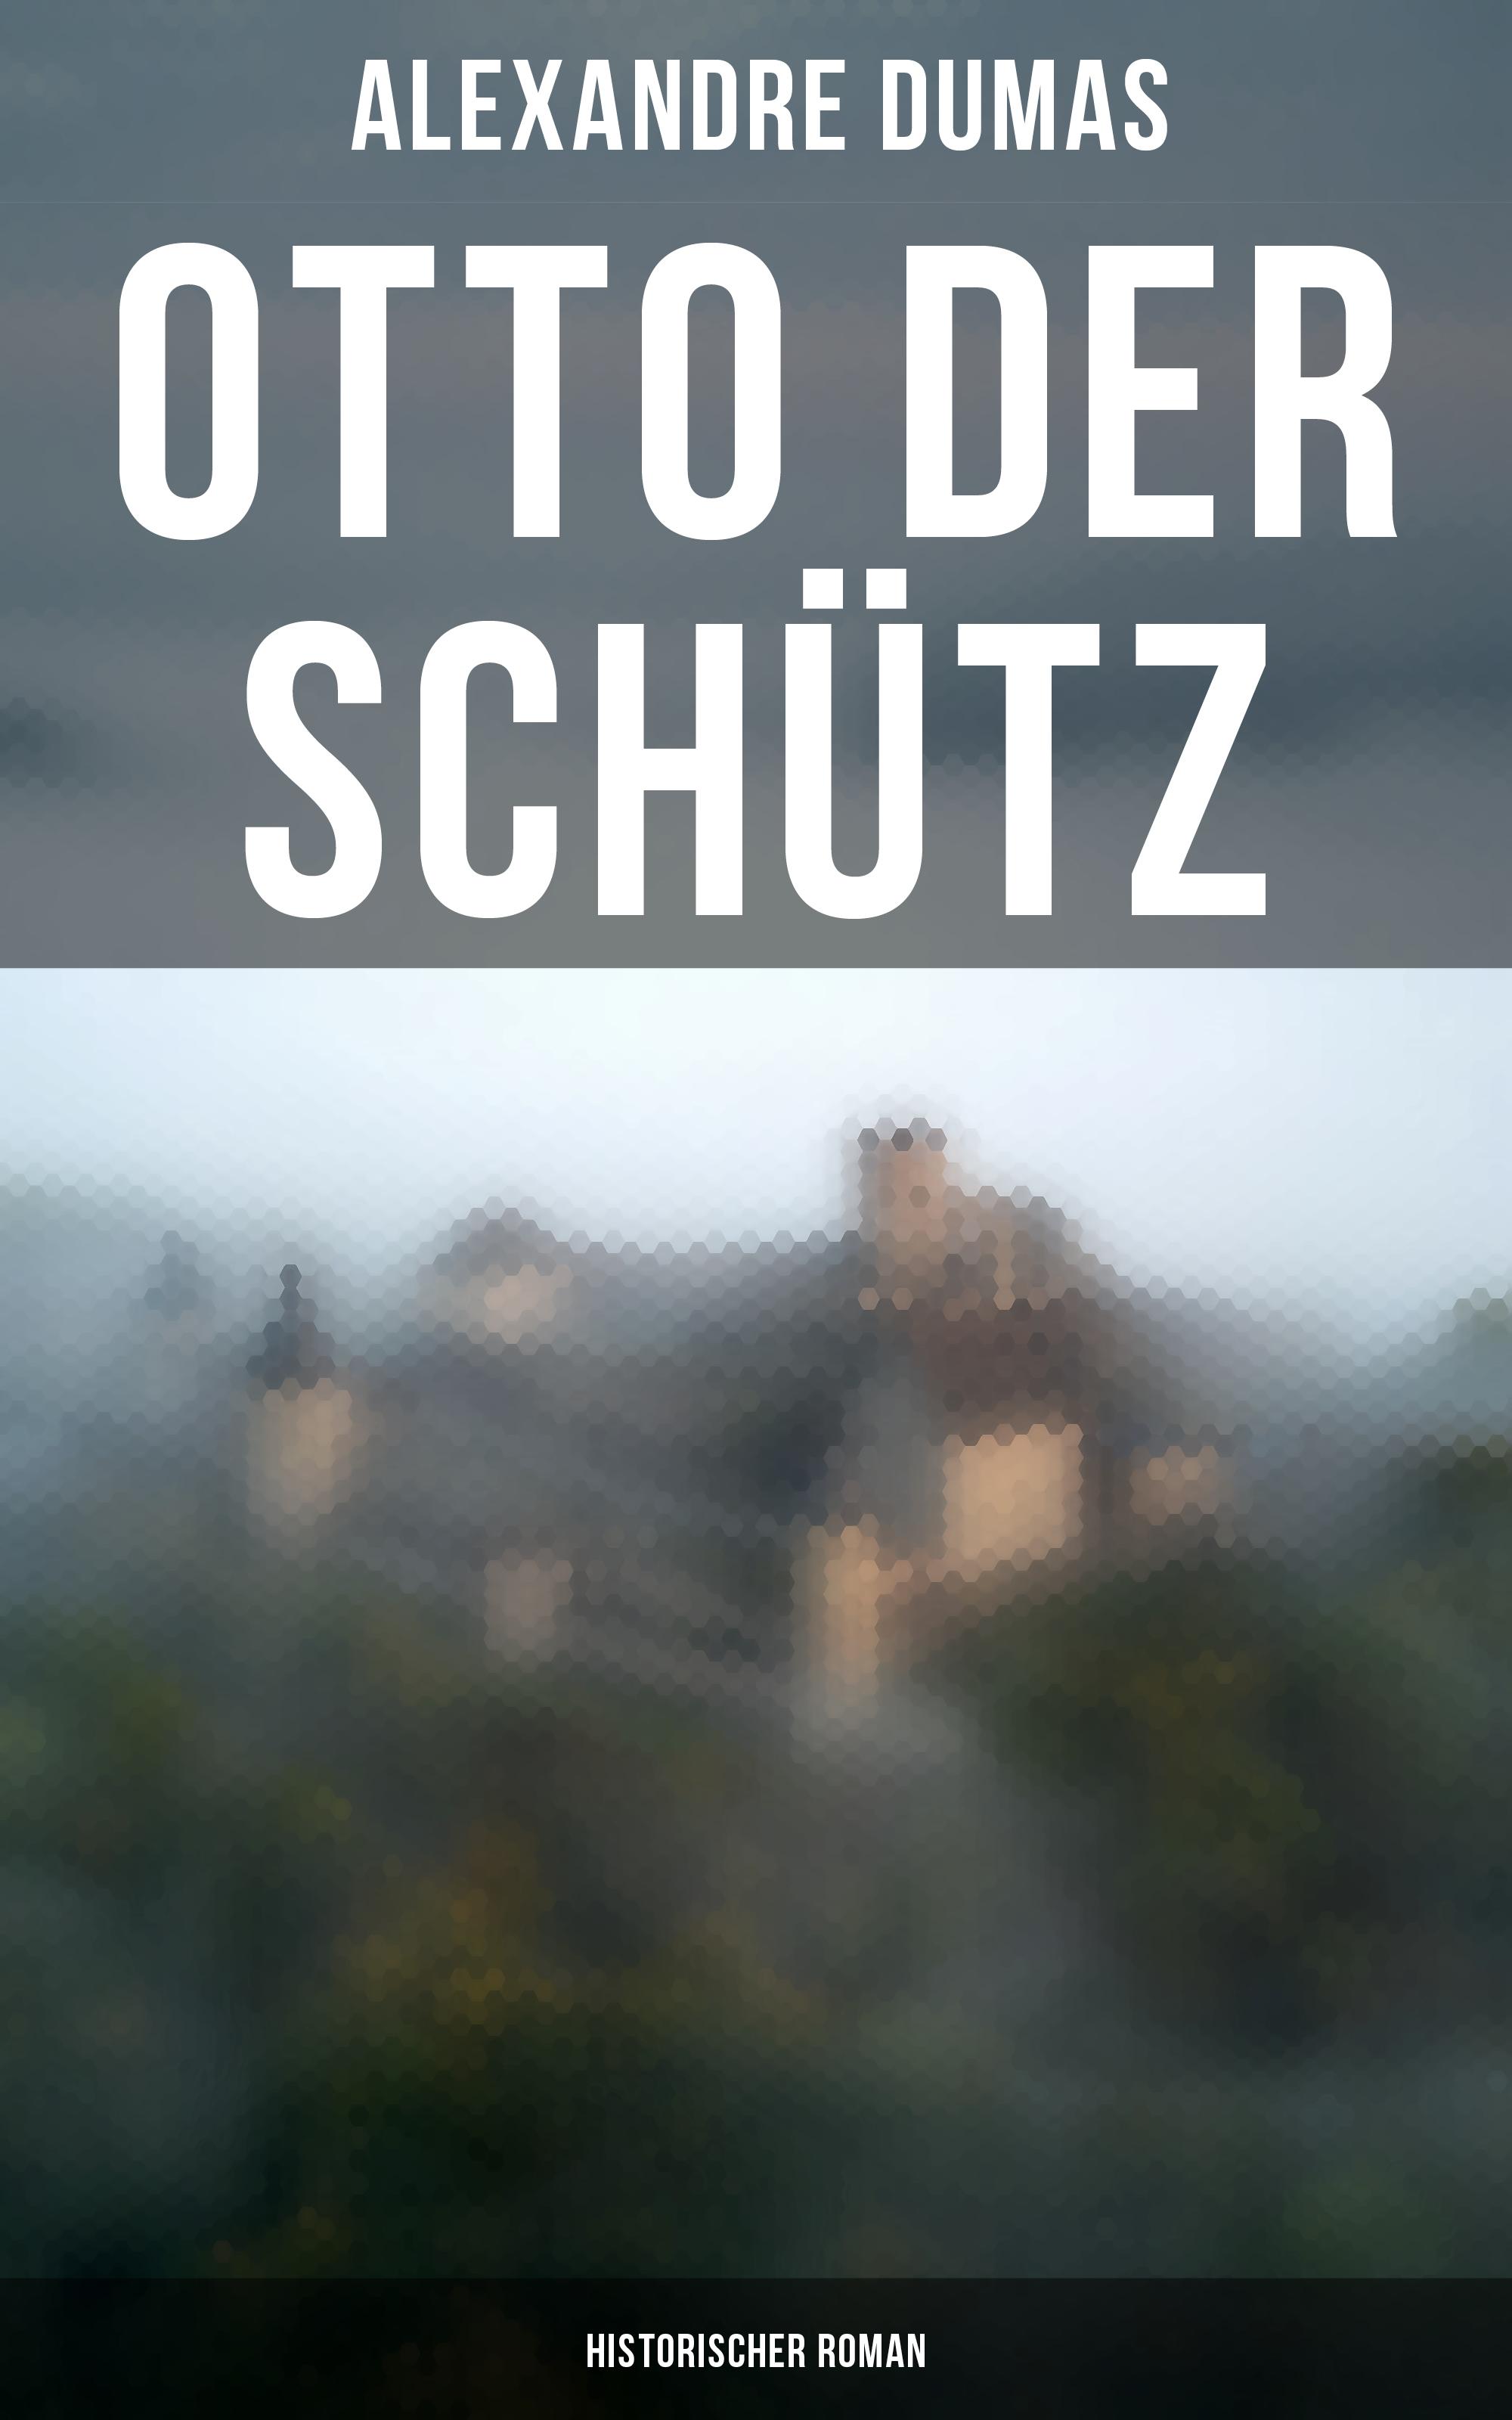 Alexandre Dumas Otto der Schütz: Historischer Roman louise otto nürnberg historischer roman